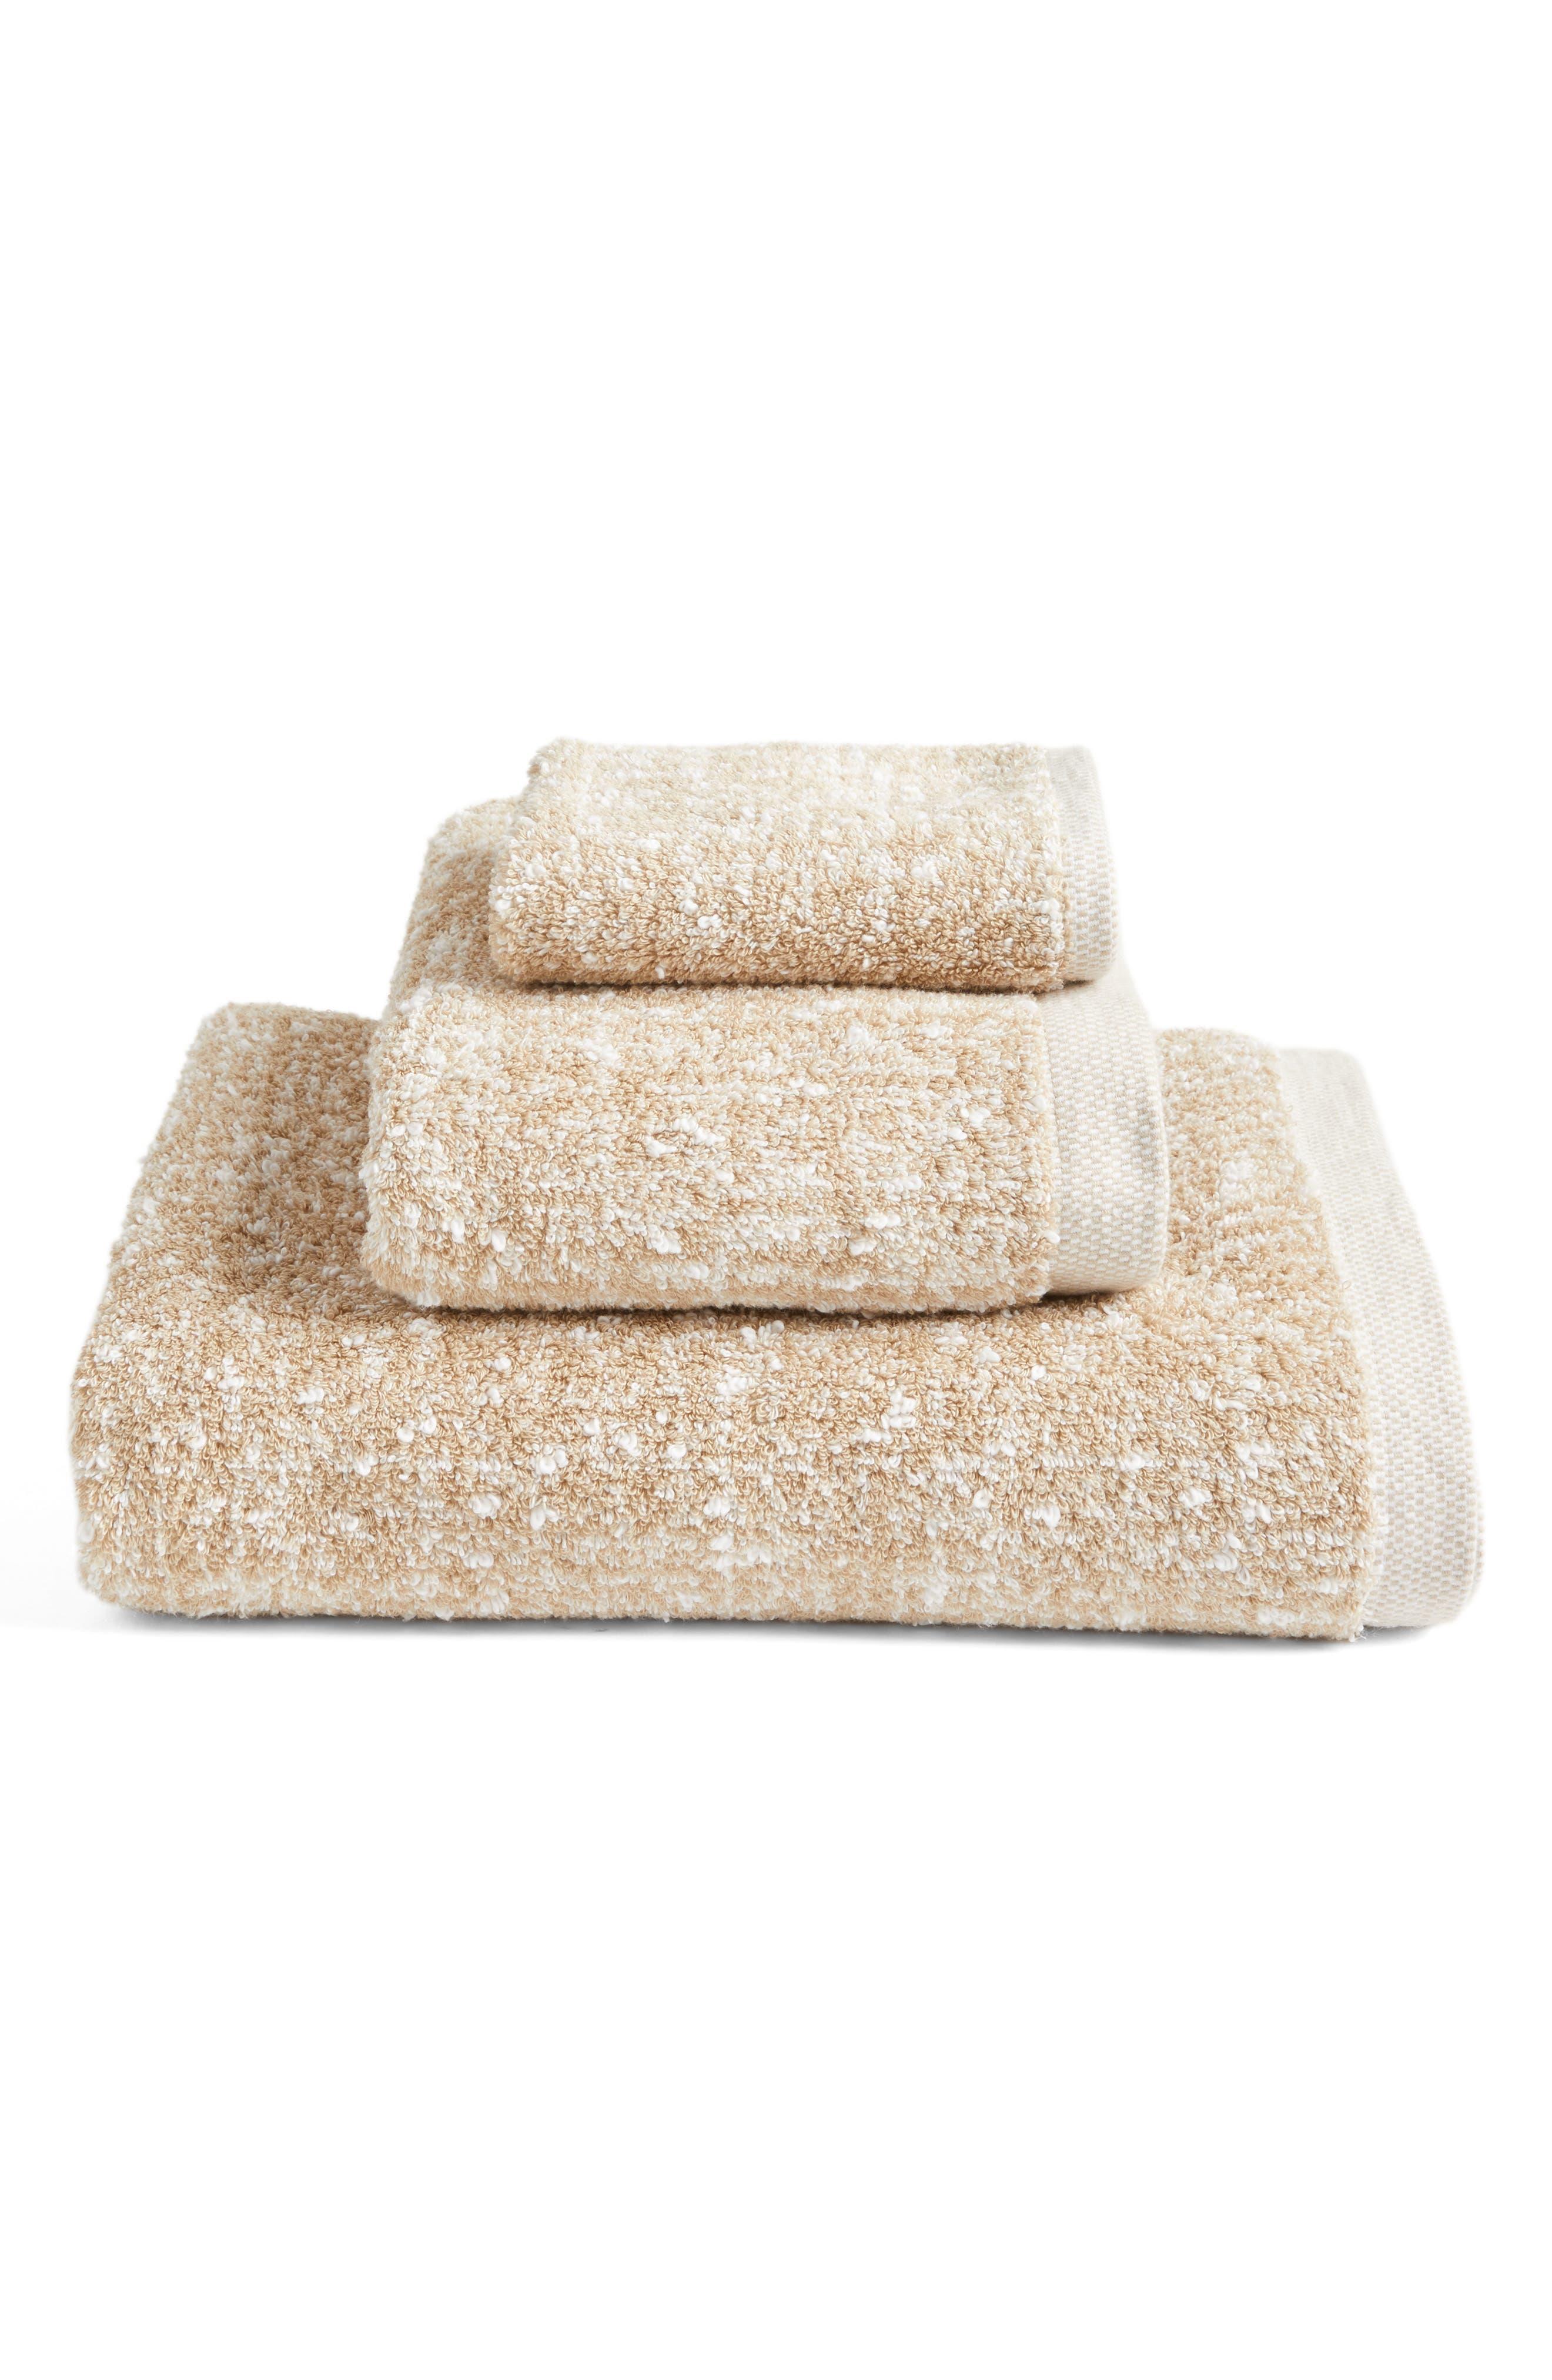 Alternate Image 3  - Nordstrom at Home Tweed Jacquard Bath Towel